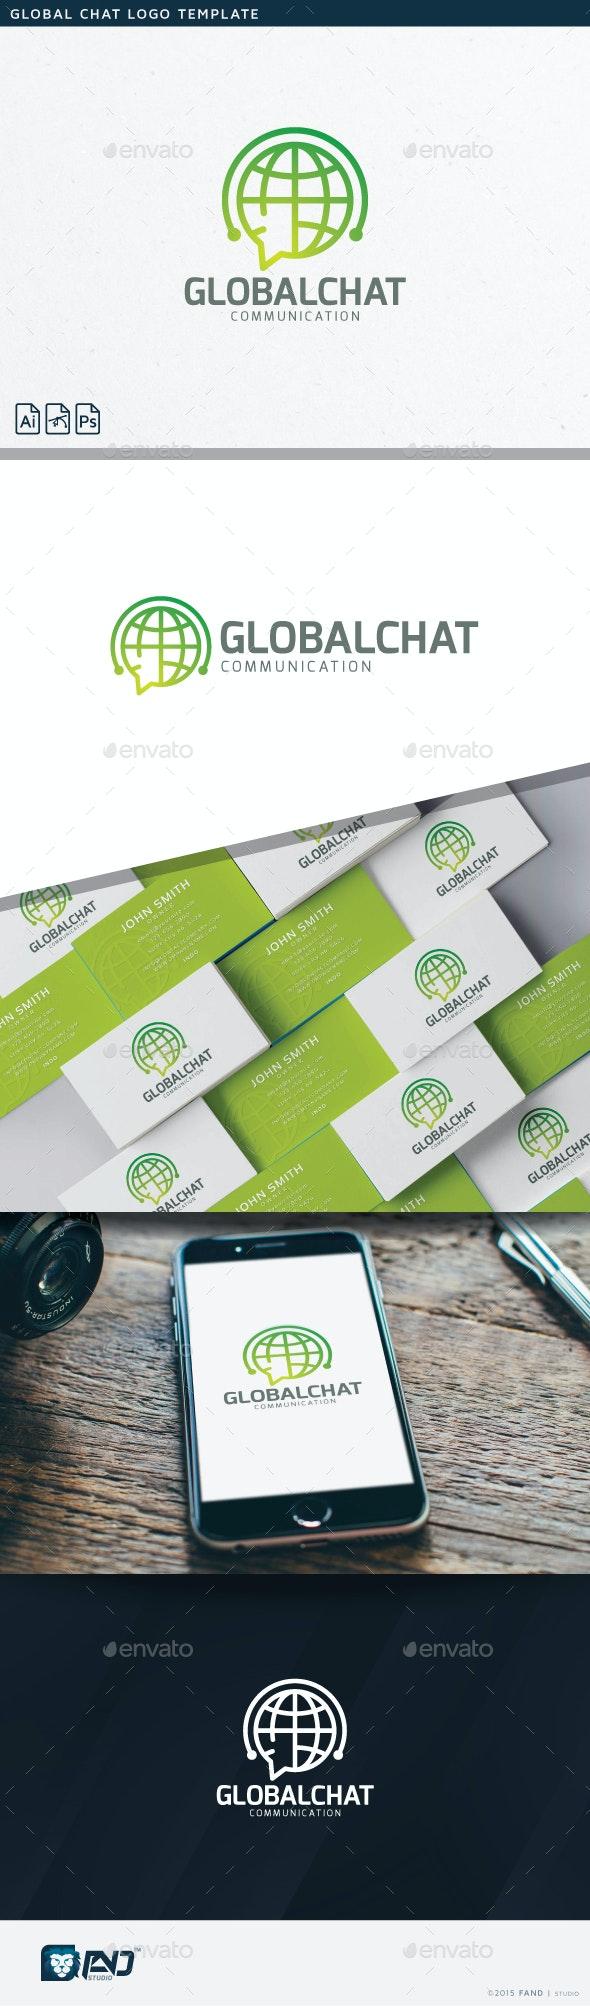 Global Chat - Symbols Logo Templates